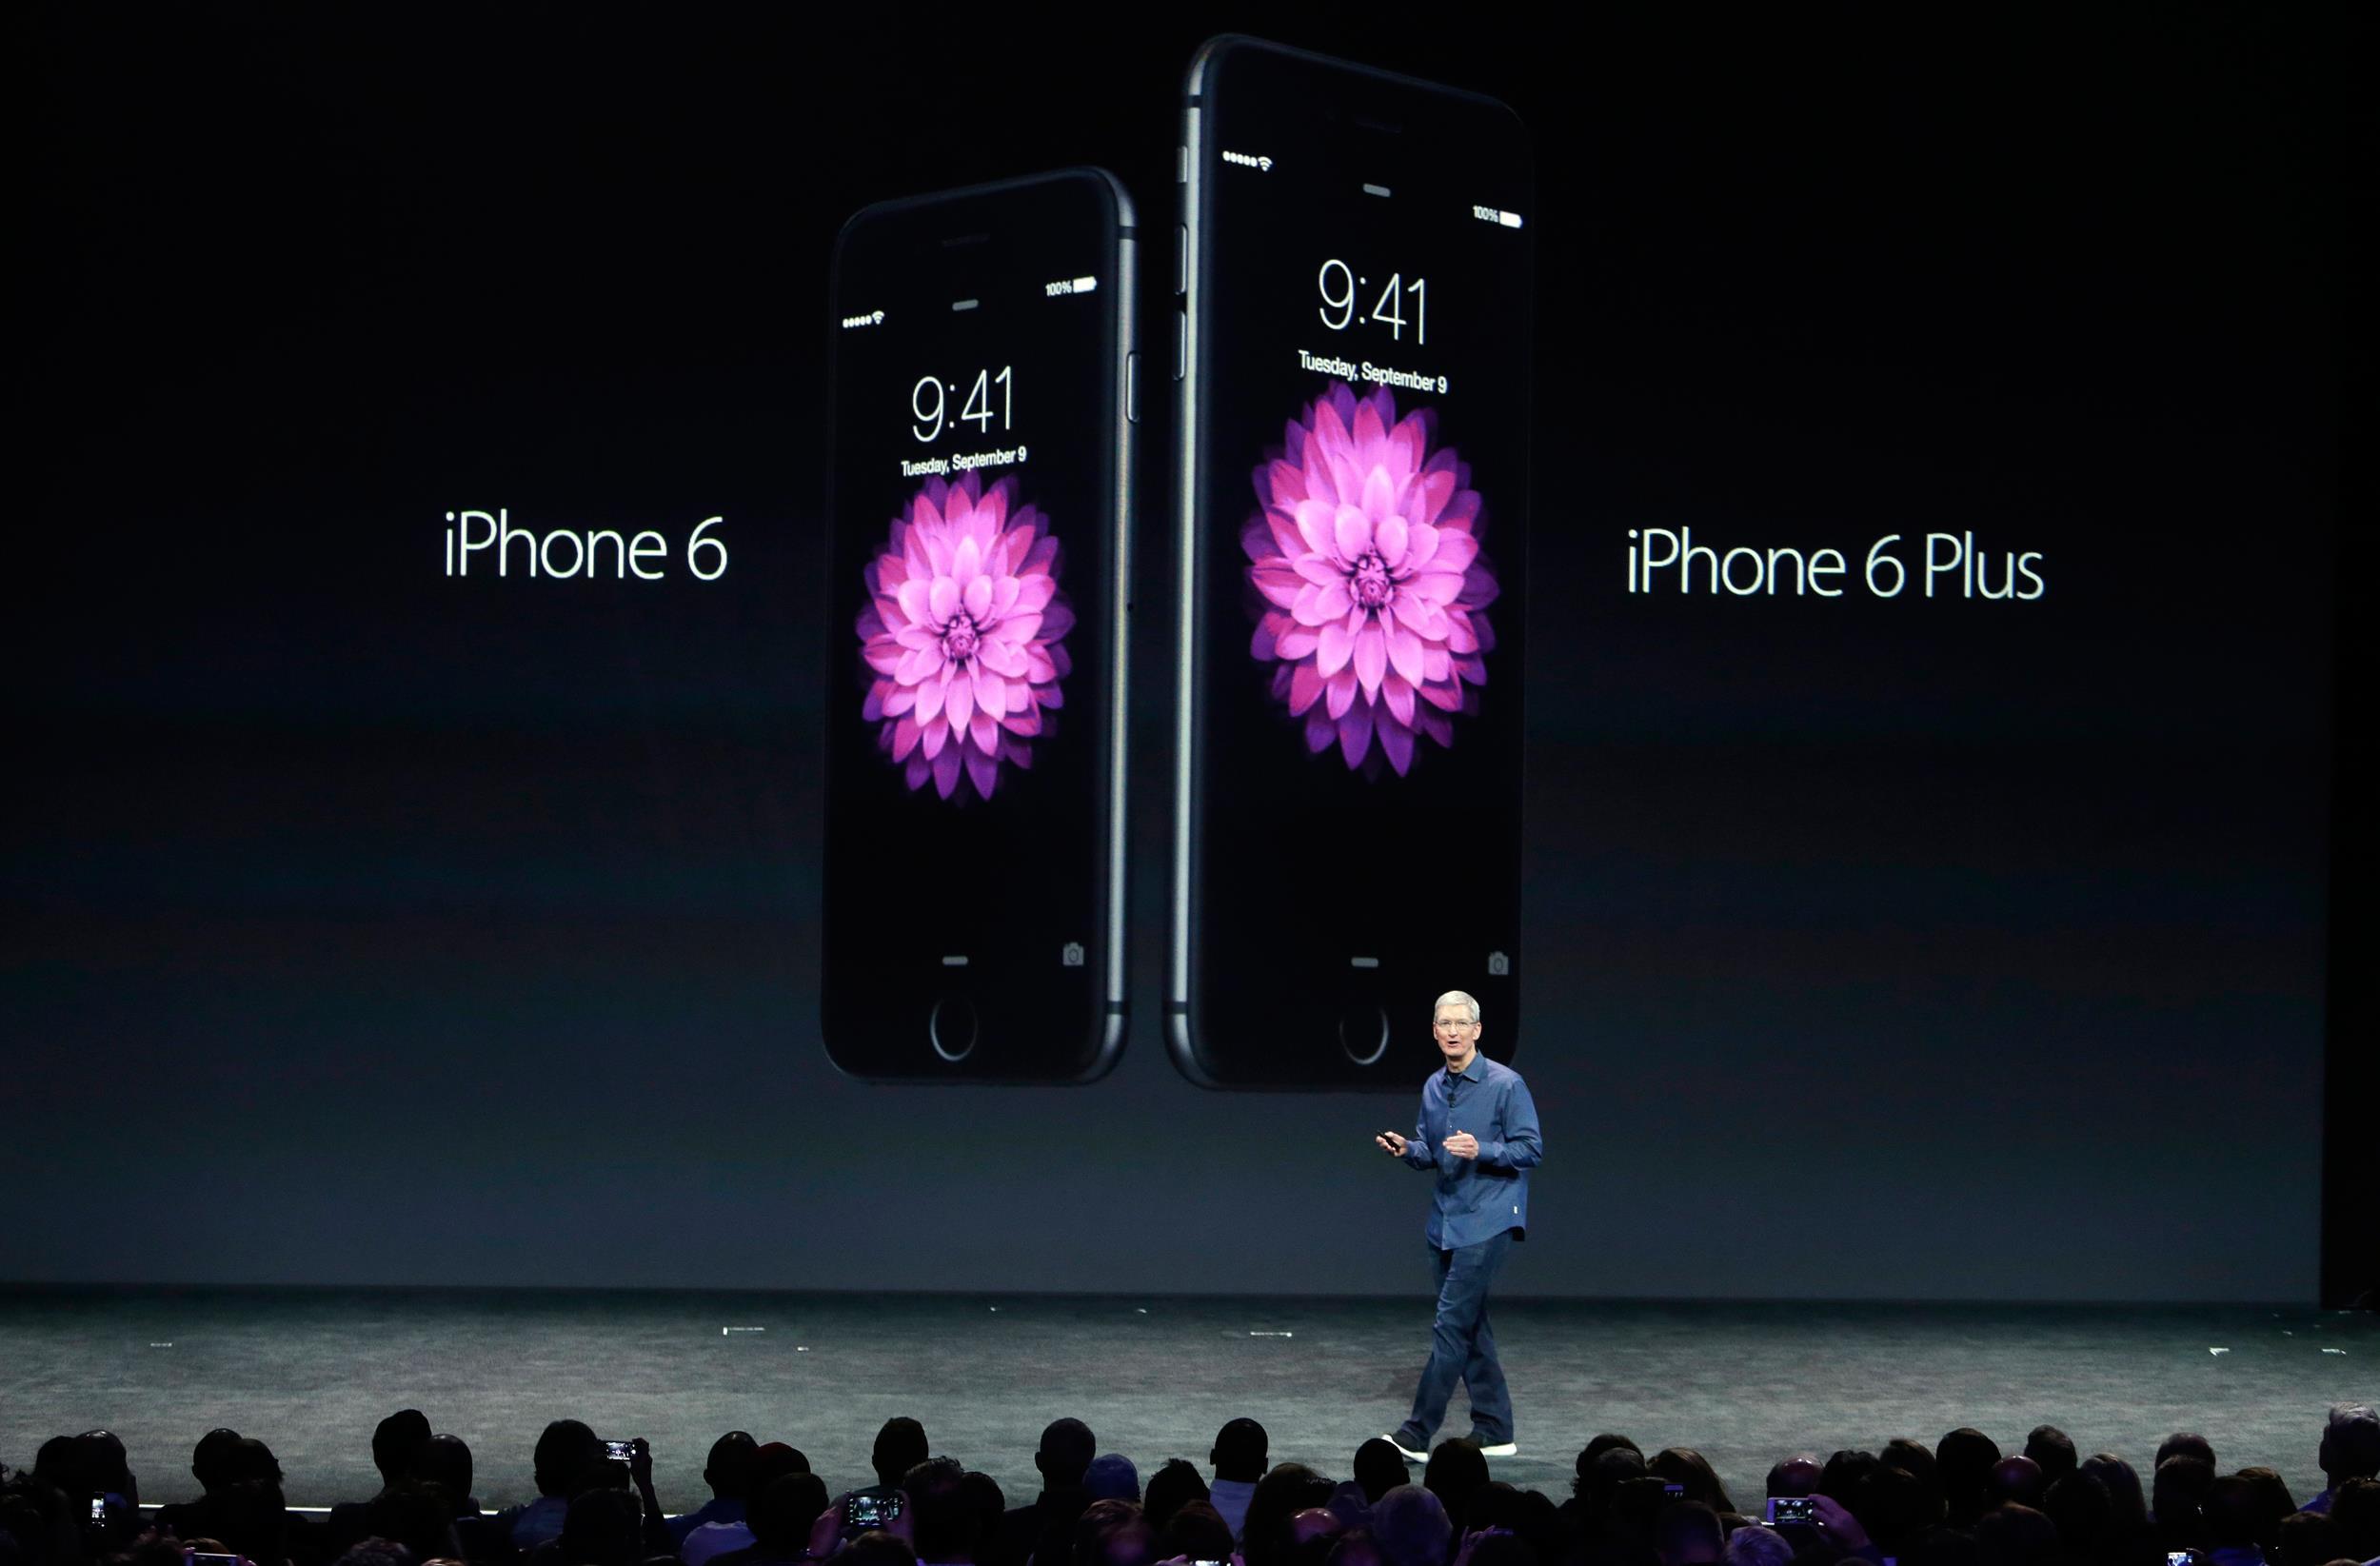 apple iphone 6 plus - Apple iPhone 6 Plus hết hàng nhanh chóng